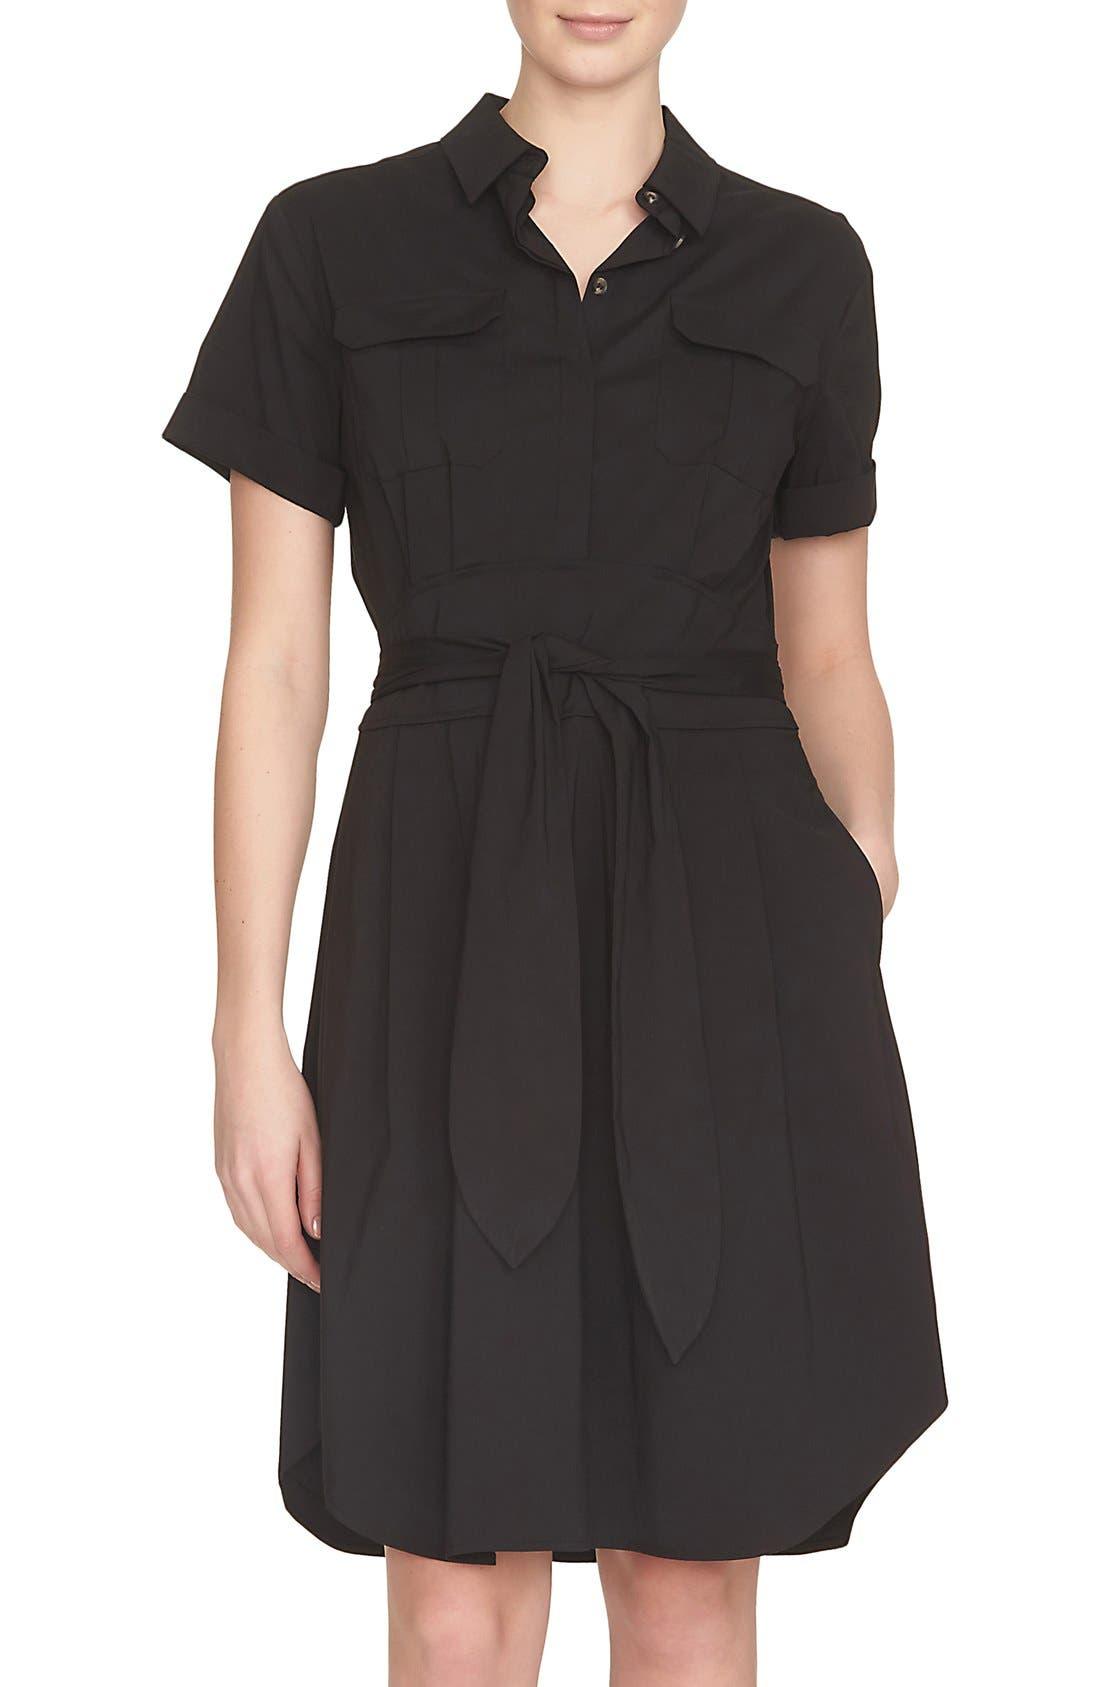 Alternate Image 1 Selected - Cynthia Steffe Maya Belted Shirtdress (Nordstrom Exclusive)